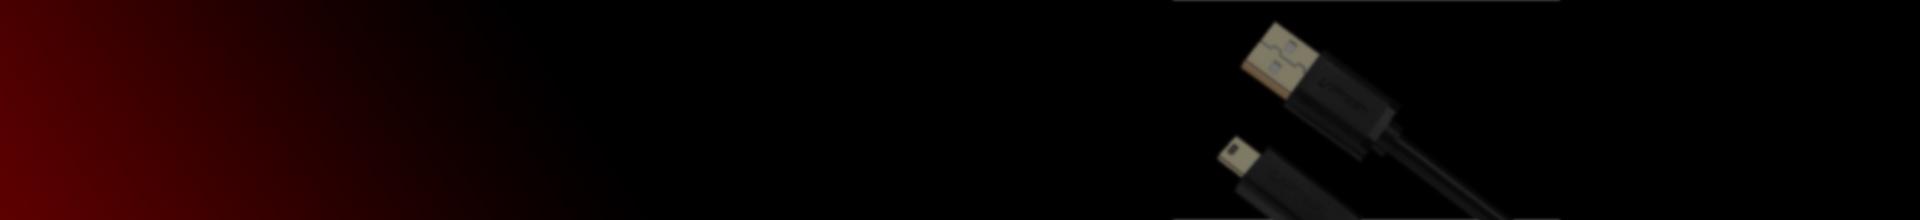 绿联(UGREEN)